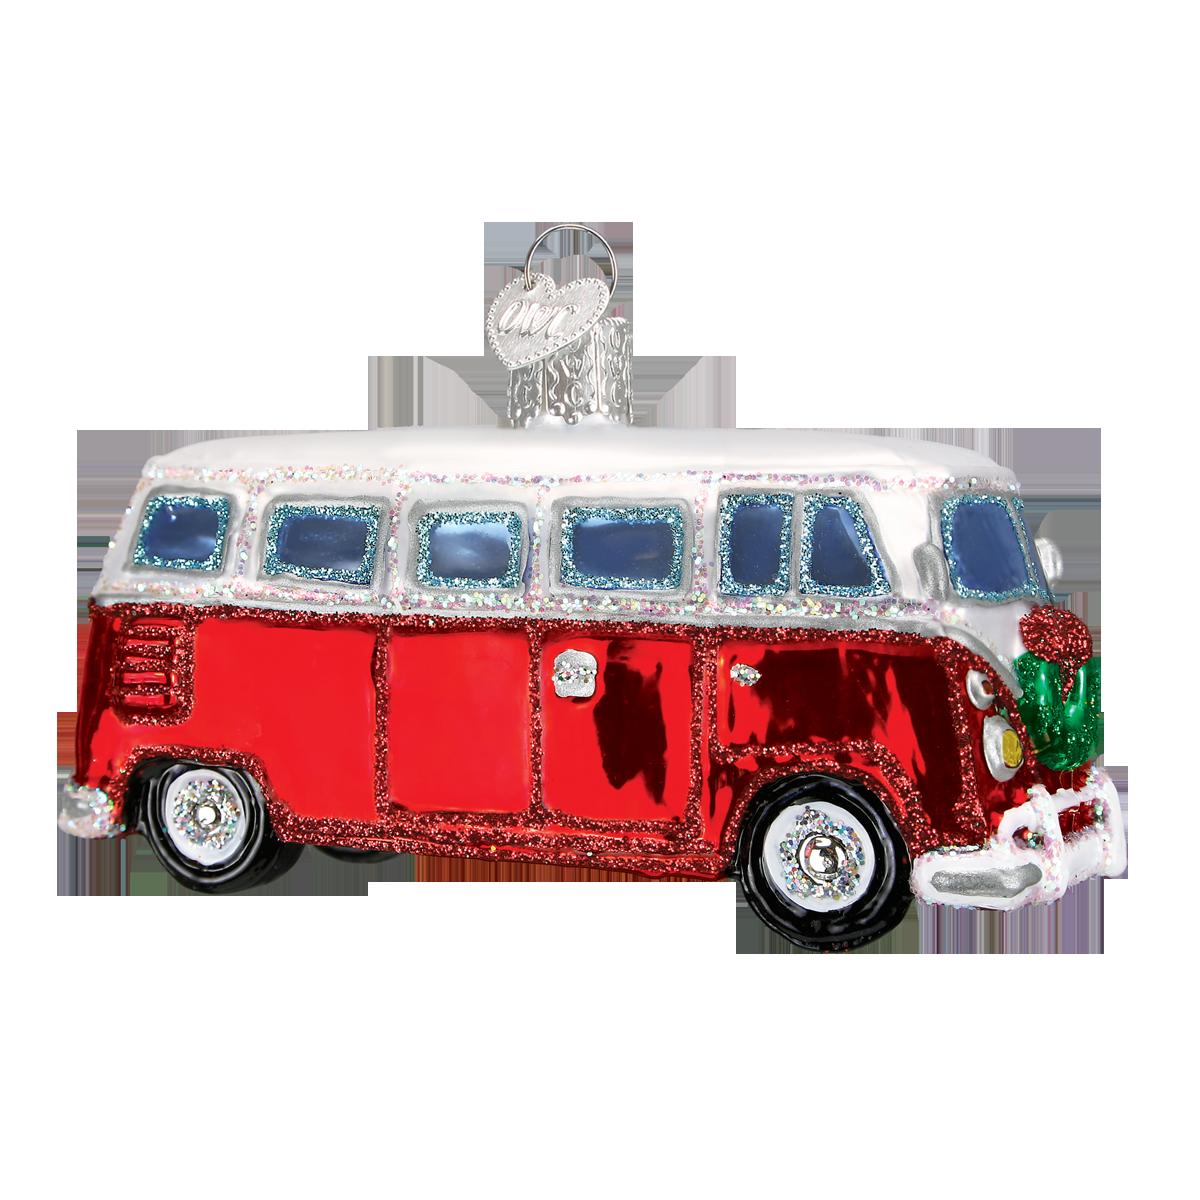 Minivan clipart vintage van vw. Camper vans are a